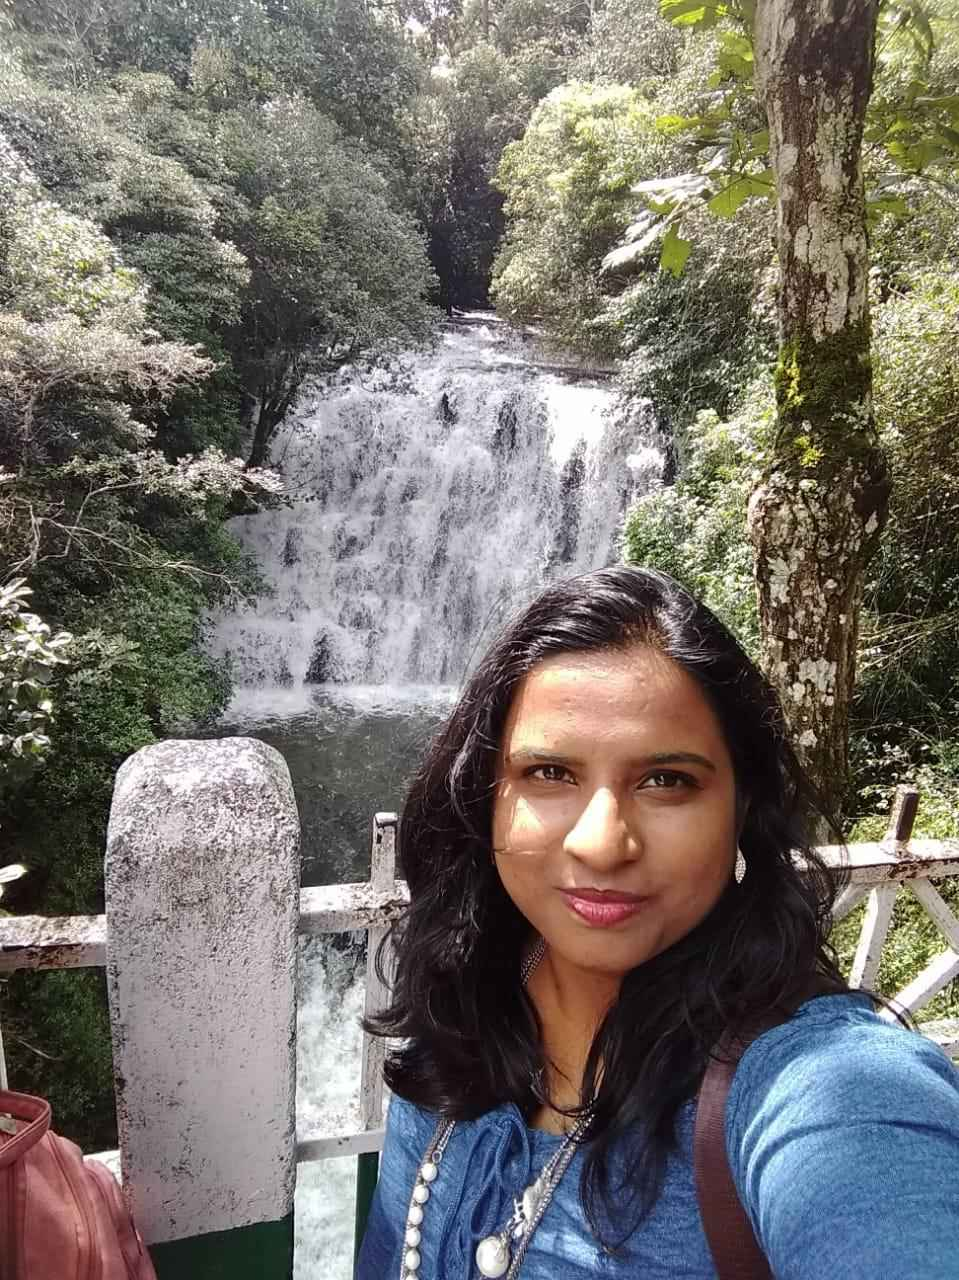 Curtain of waterfalls #Selfiewithaview #Tripotocommunity